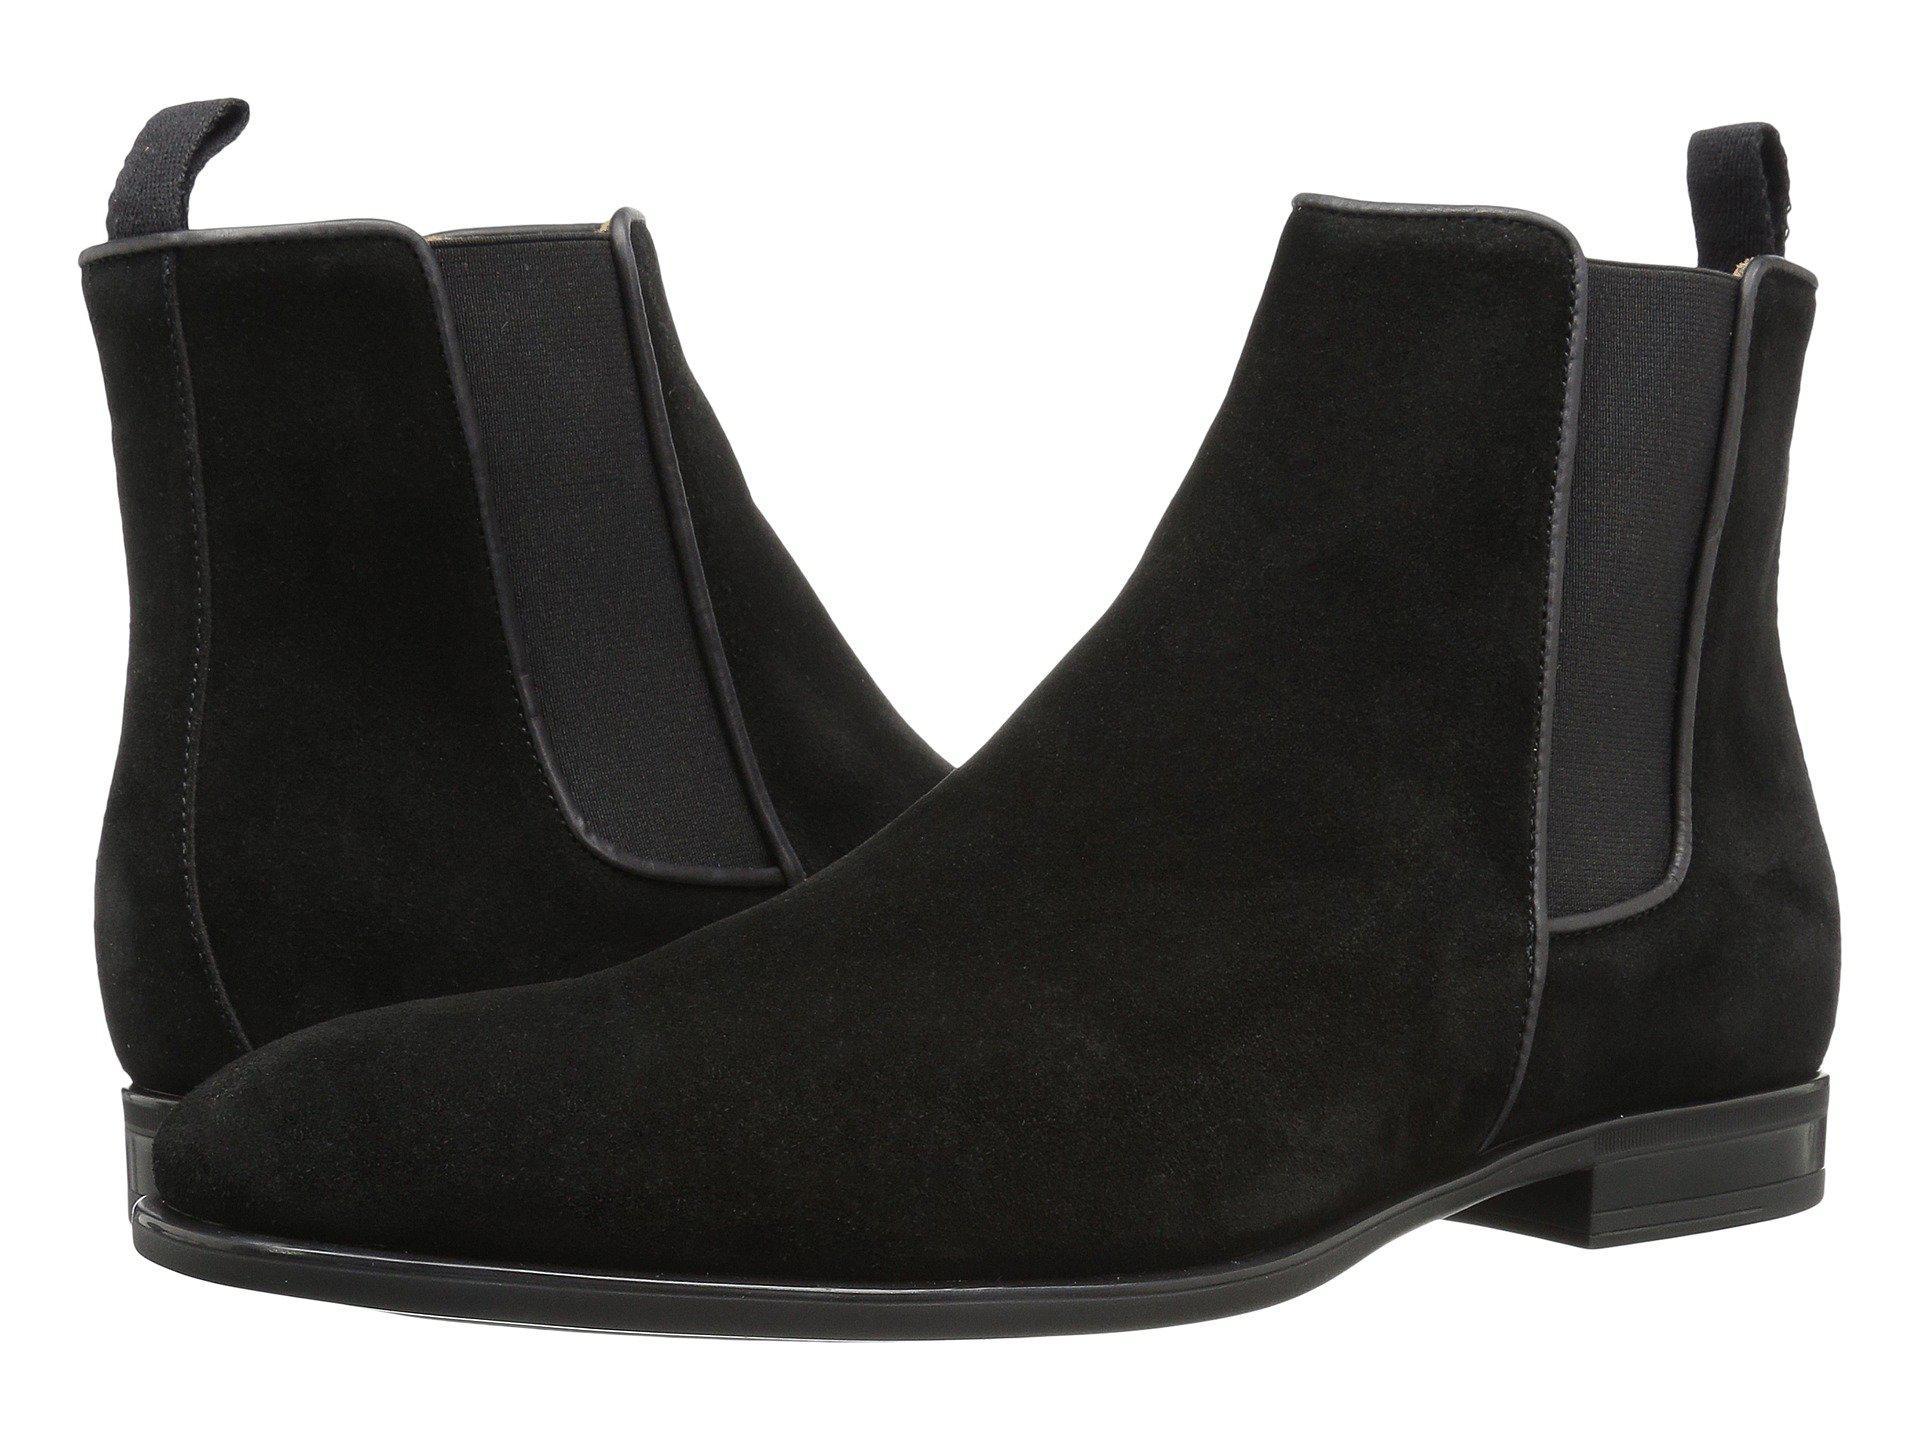 58193ada491 Lyst - Aquatalia Adrian (black Dress Suede) Men s Pull-on Boots in ...